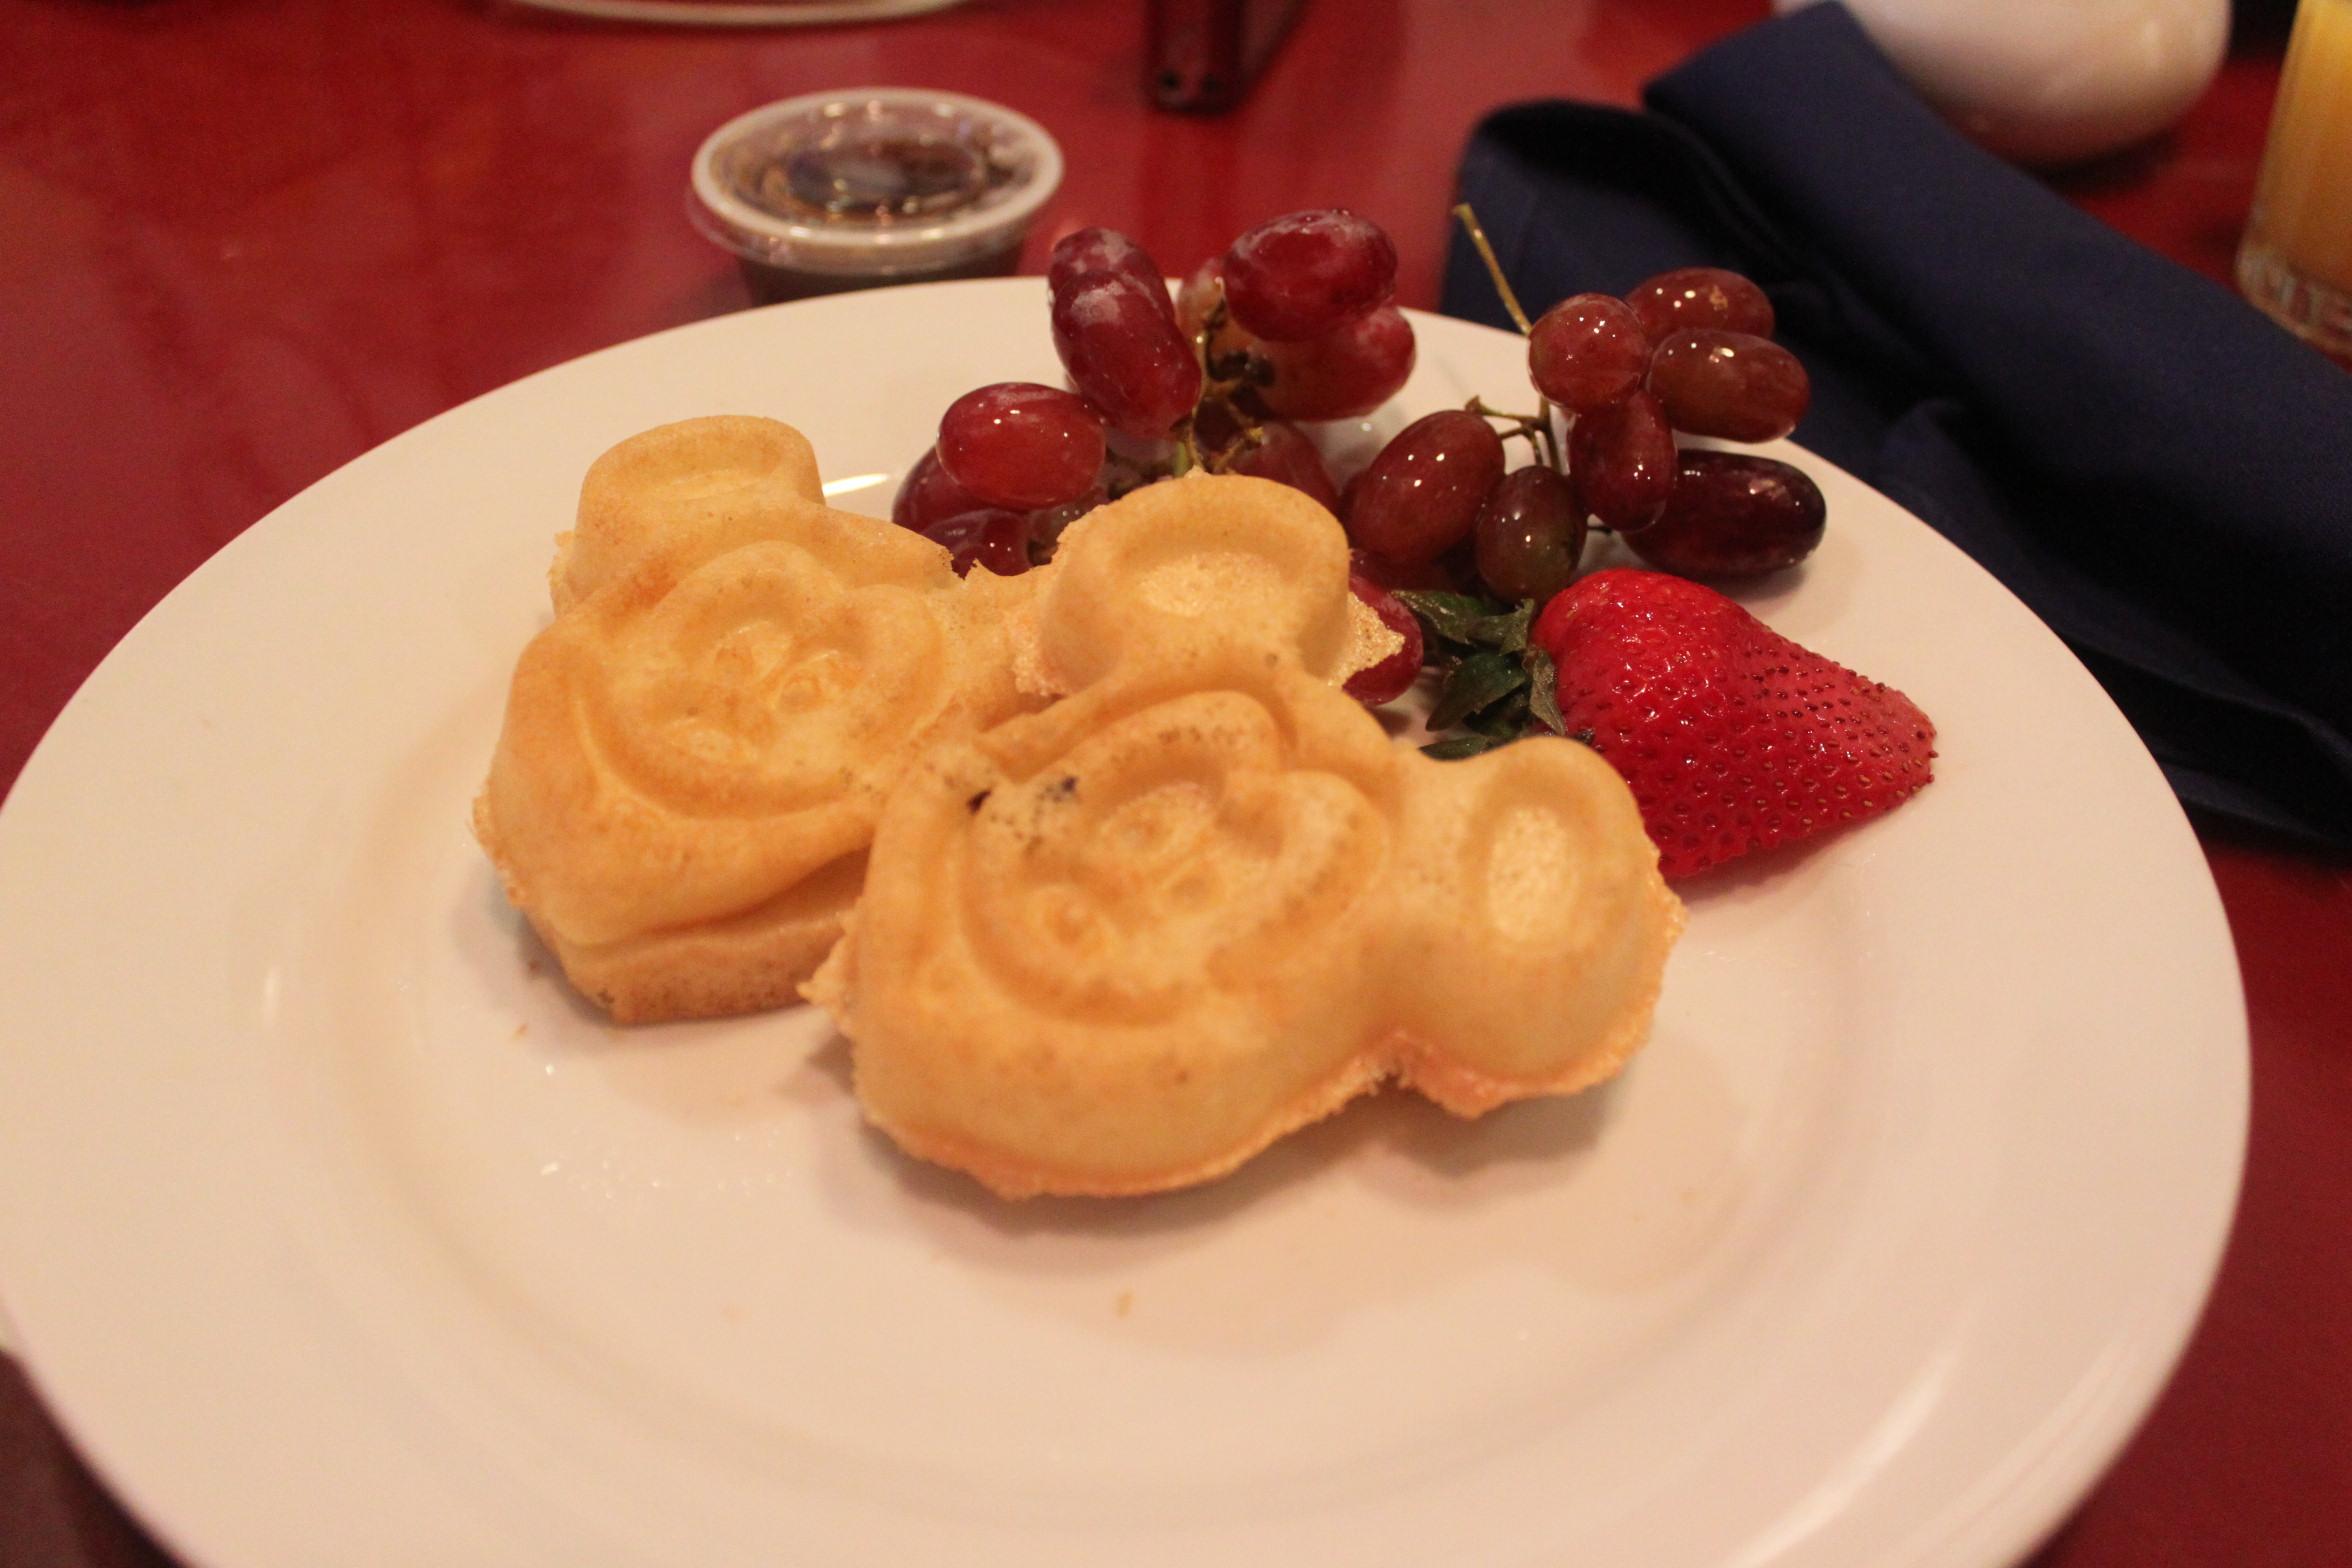 Gluten-free, dairy-free Mickey waffles